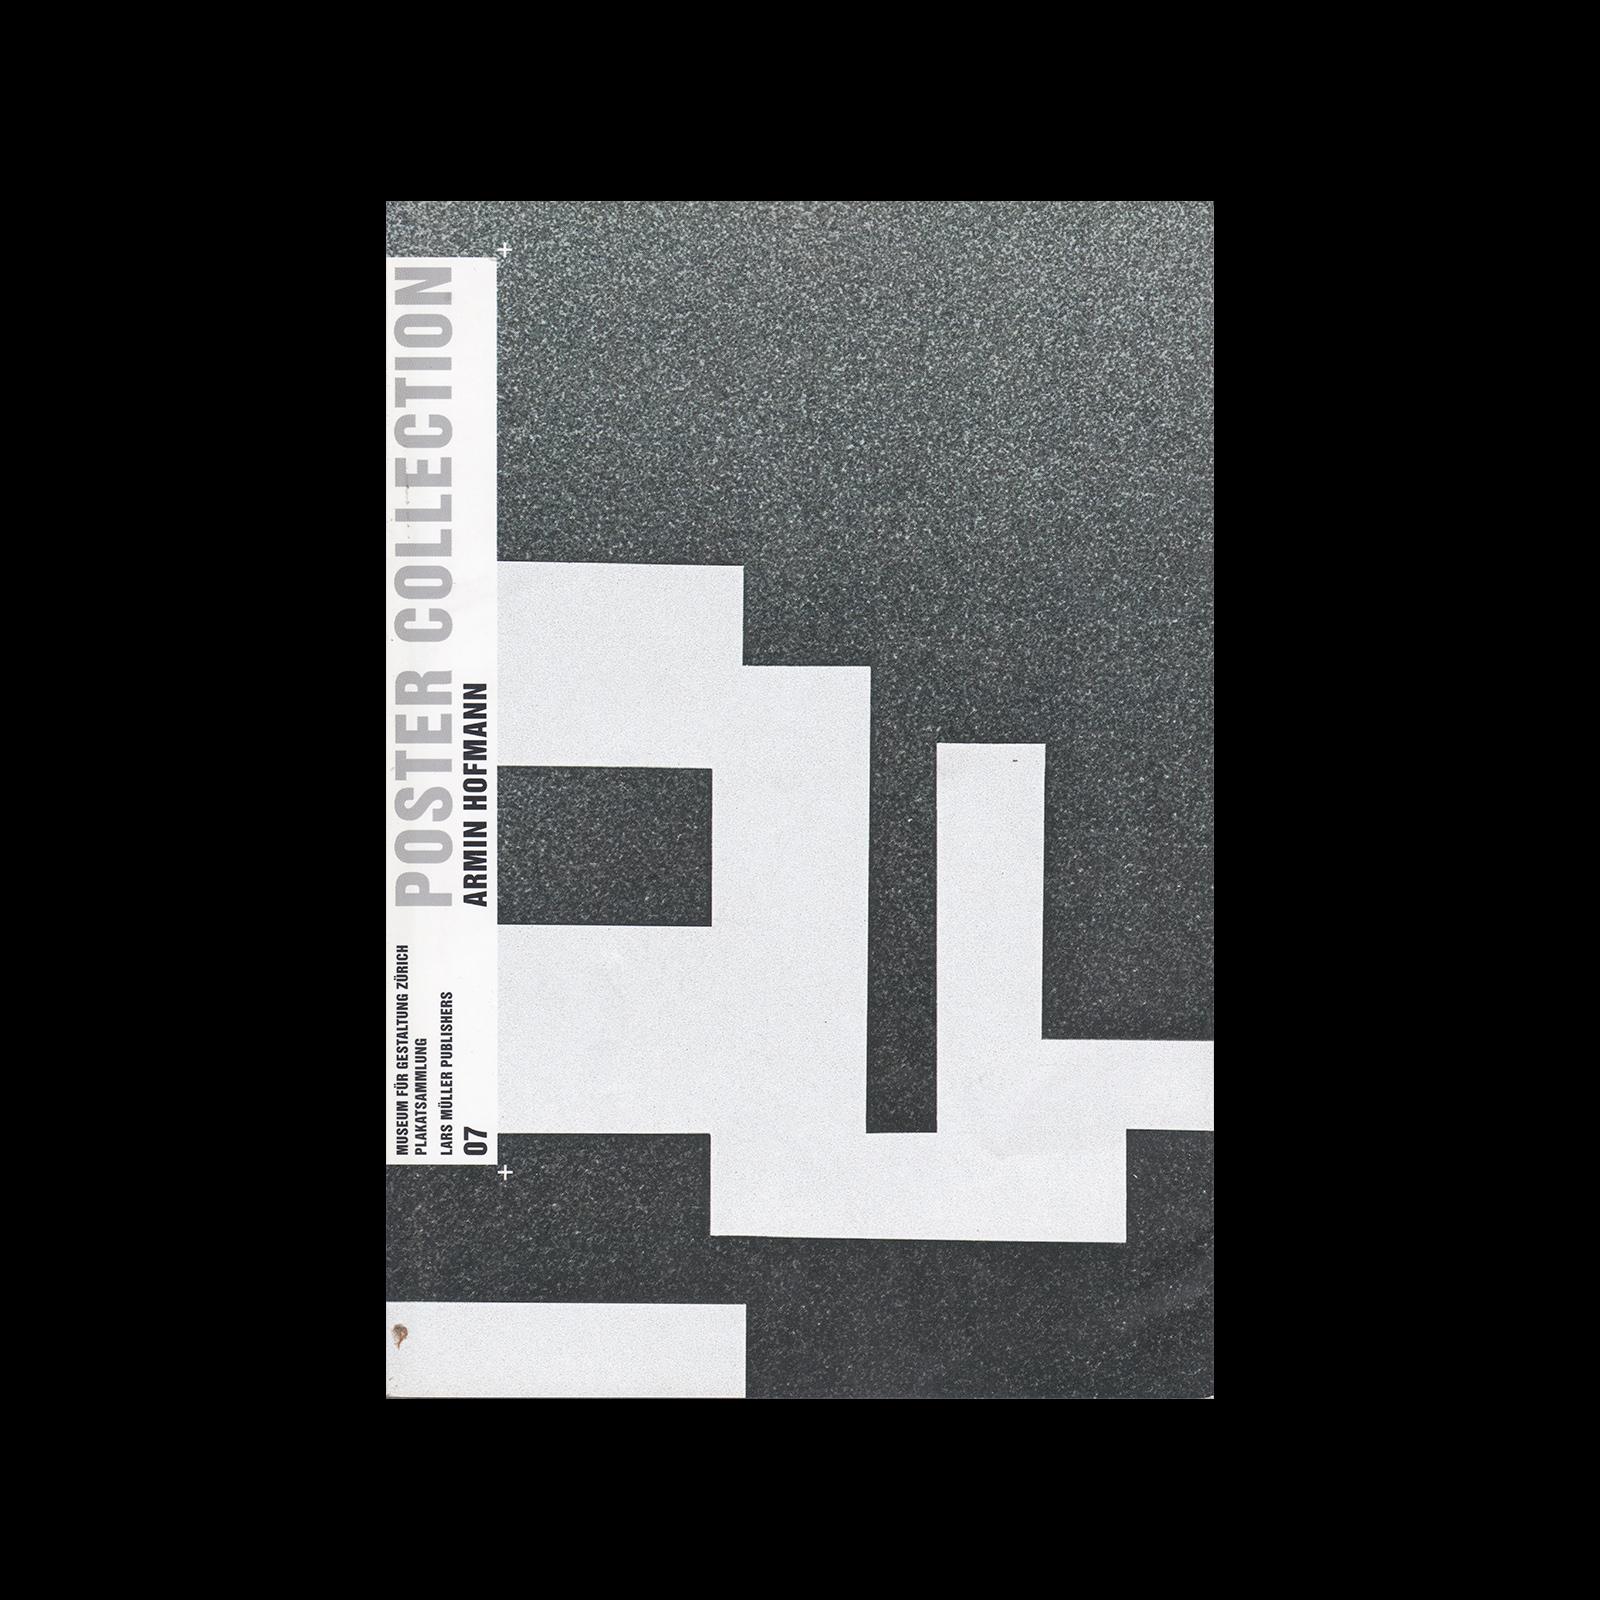 Armin Hofmann, Poster Collection 7, 2003